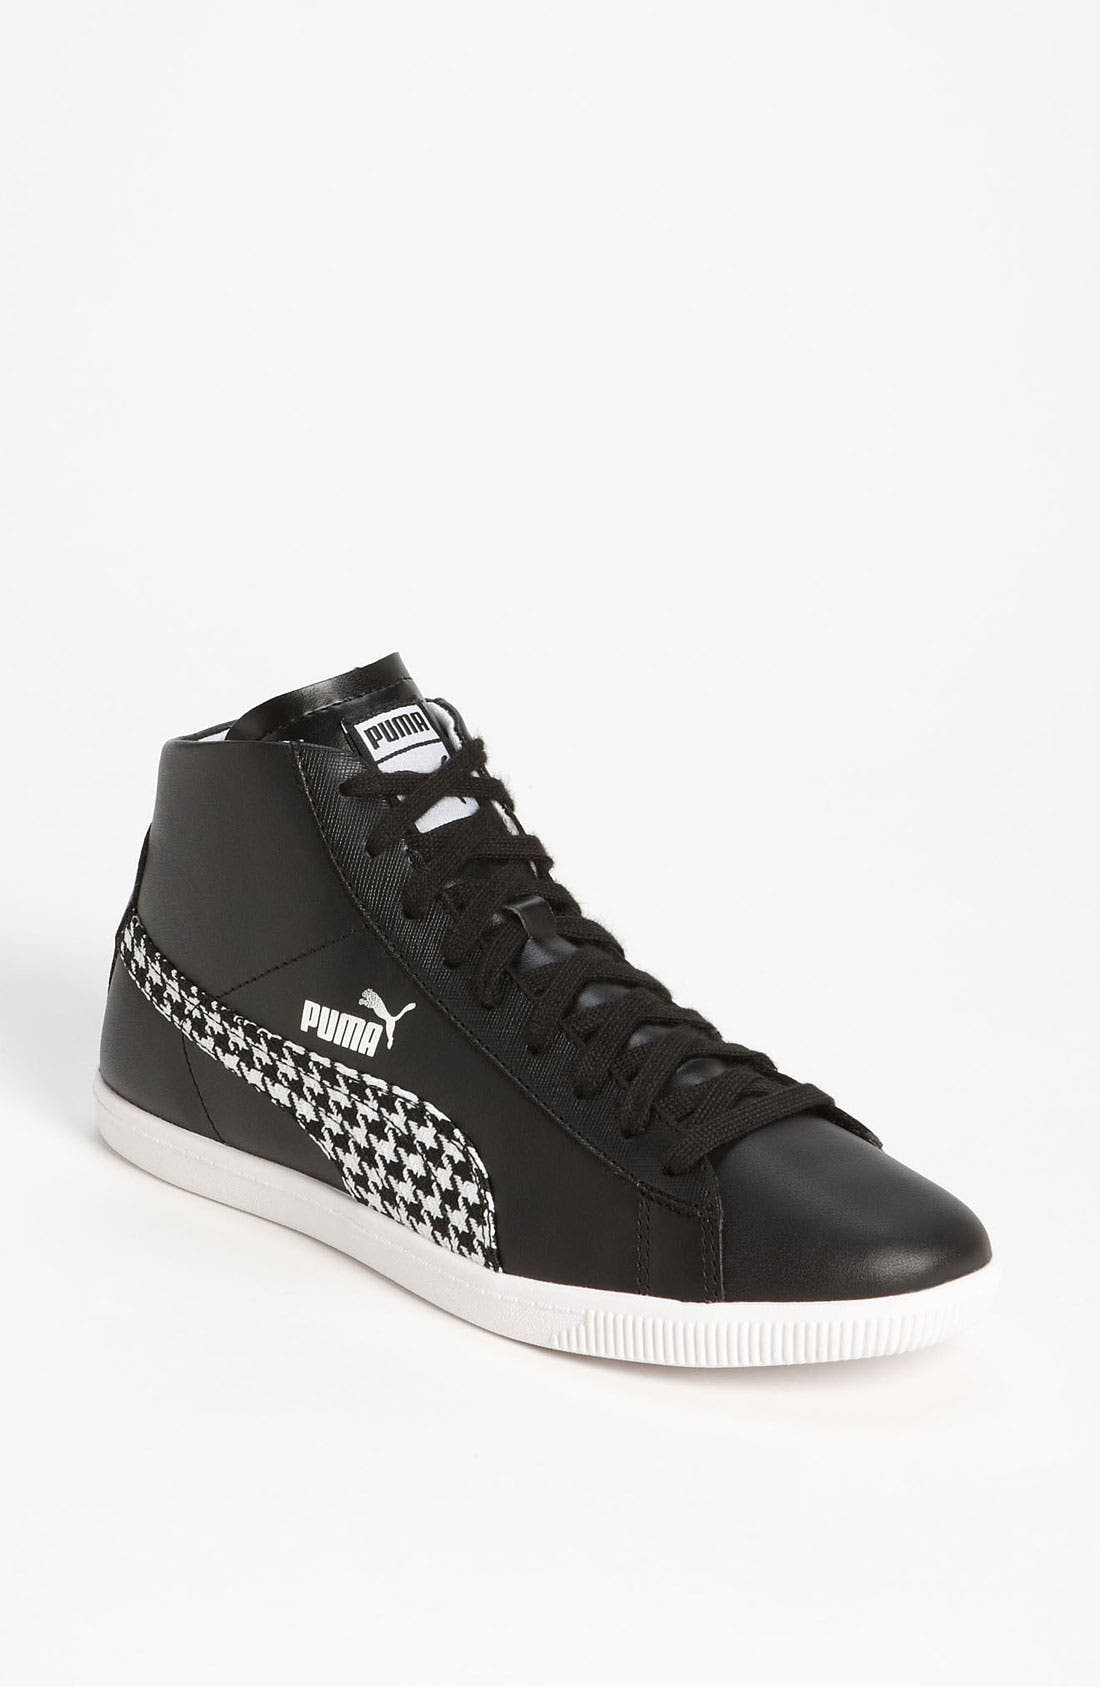 Alternate Image 1 Selected - PUMA 'Glyde Herringbone Mid' Sneaker (Women)